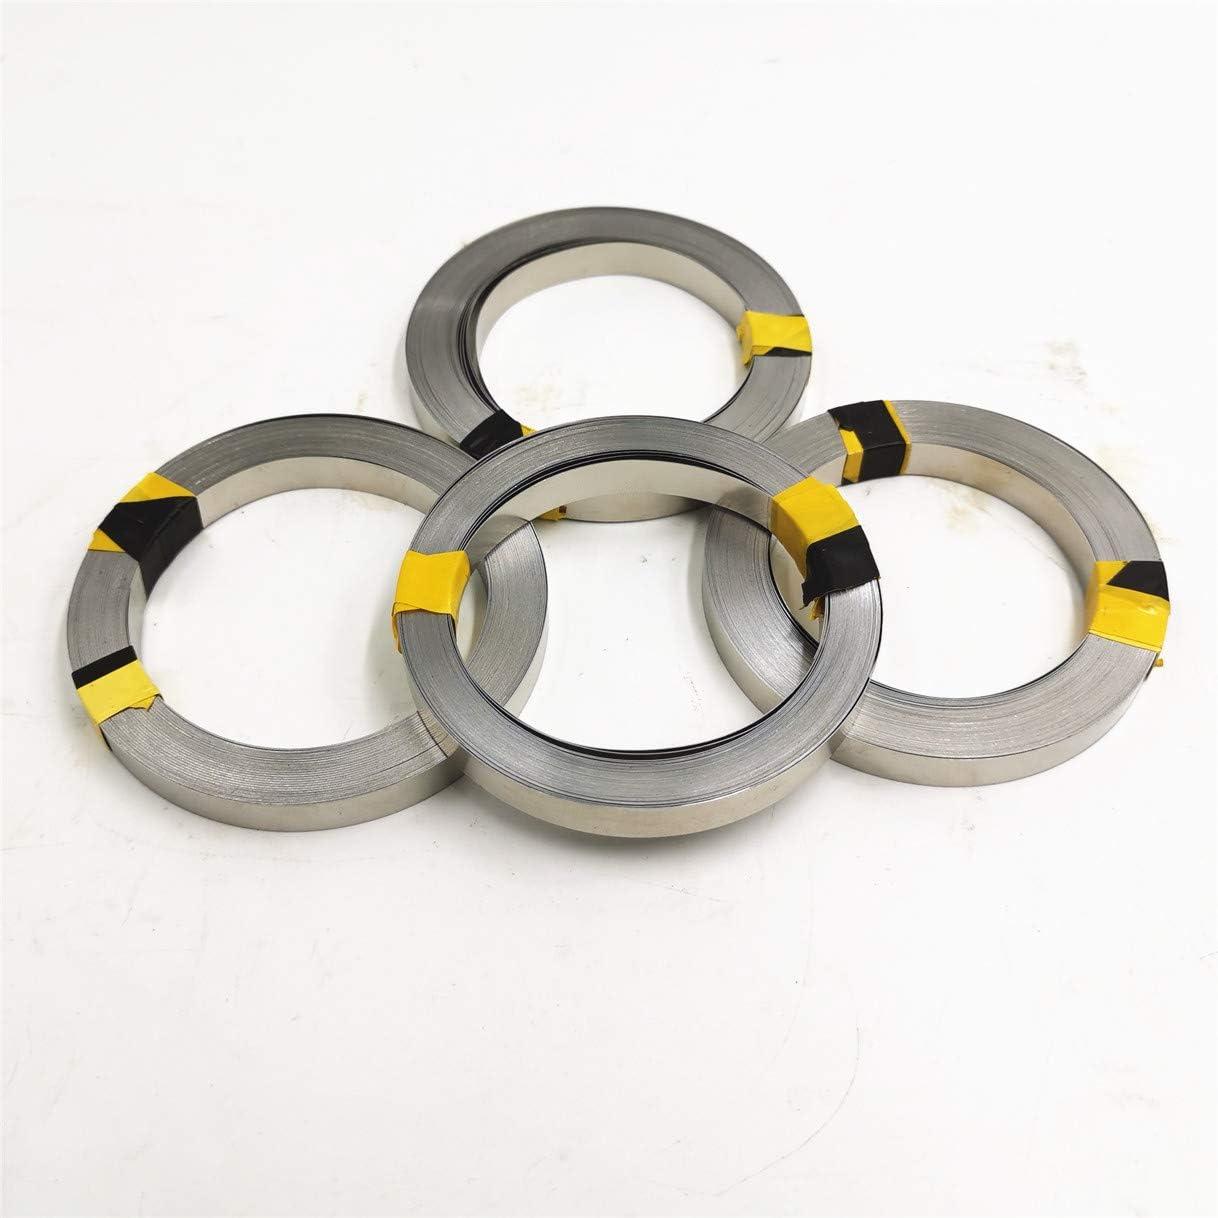 10m Nickel-plated Strip Tape Sheets for Li 18650 Battery Spot Welding Accessory